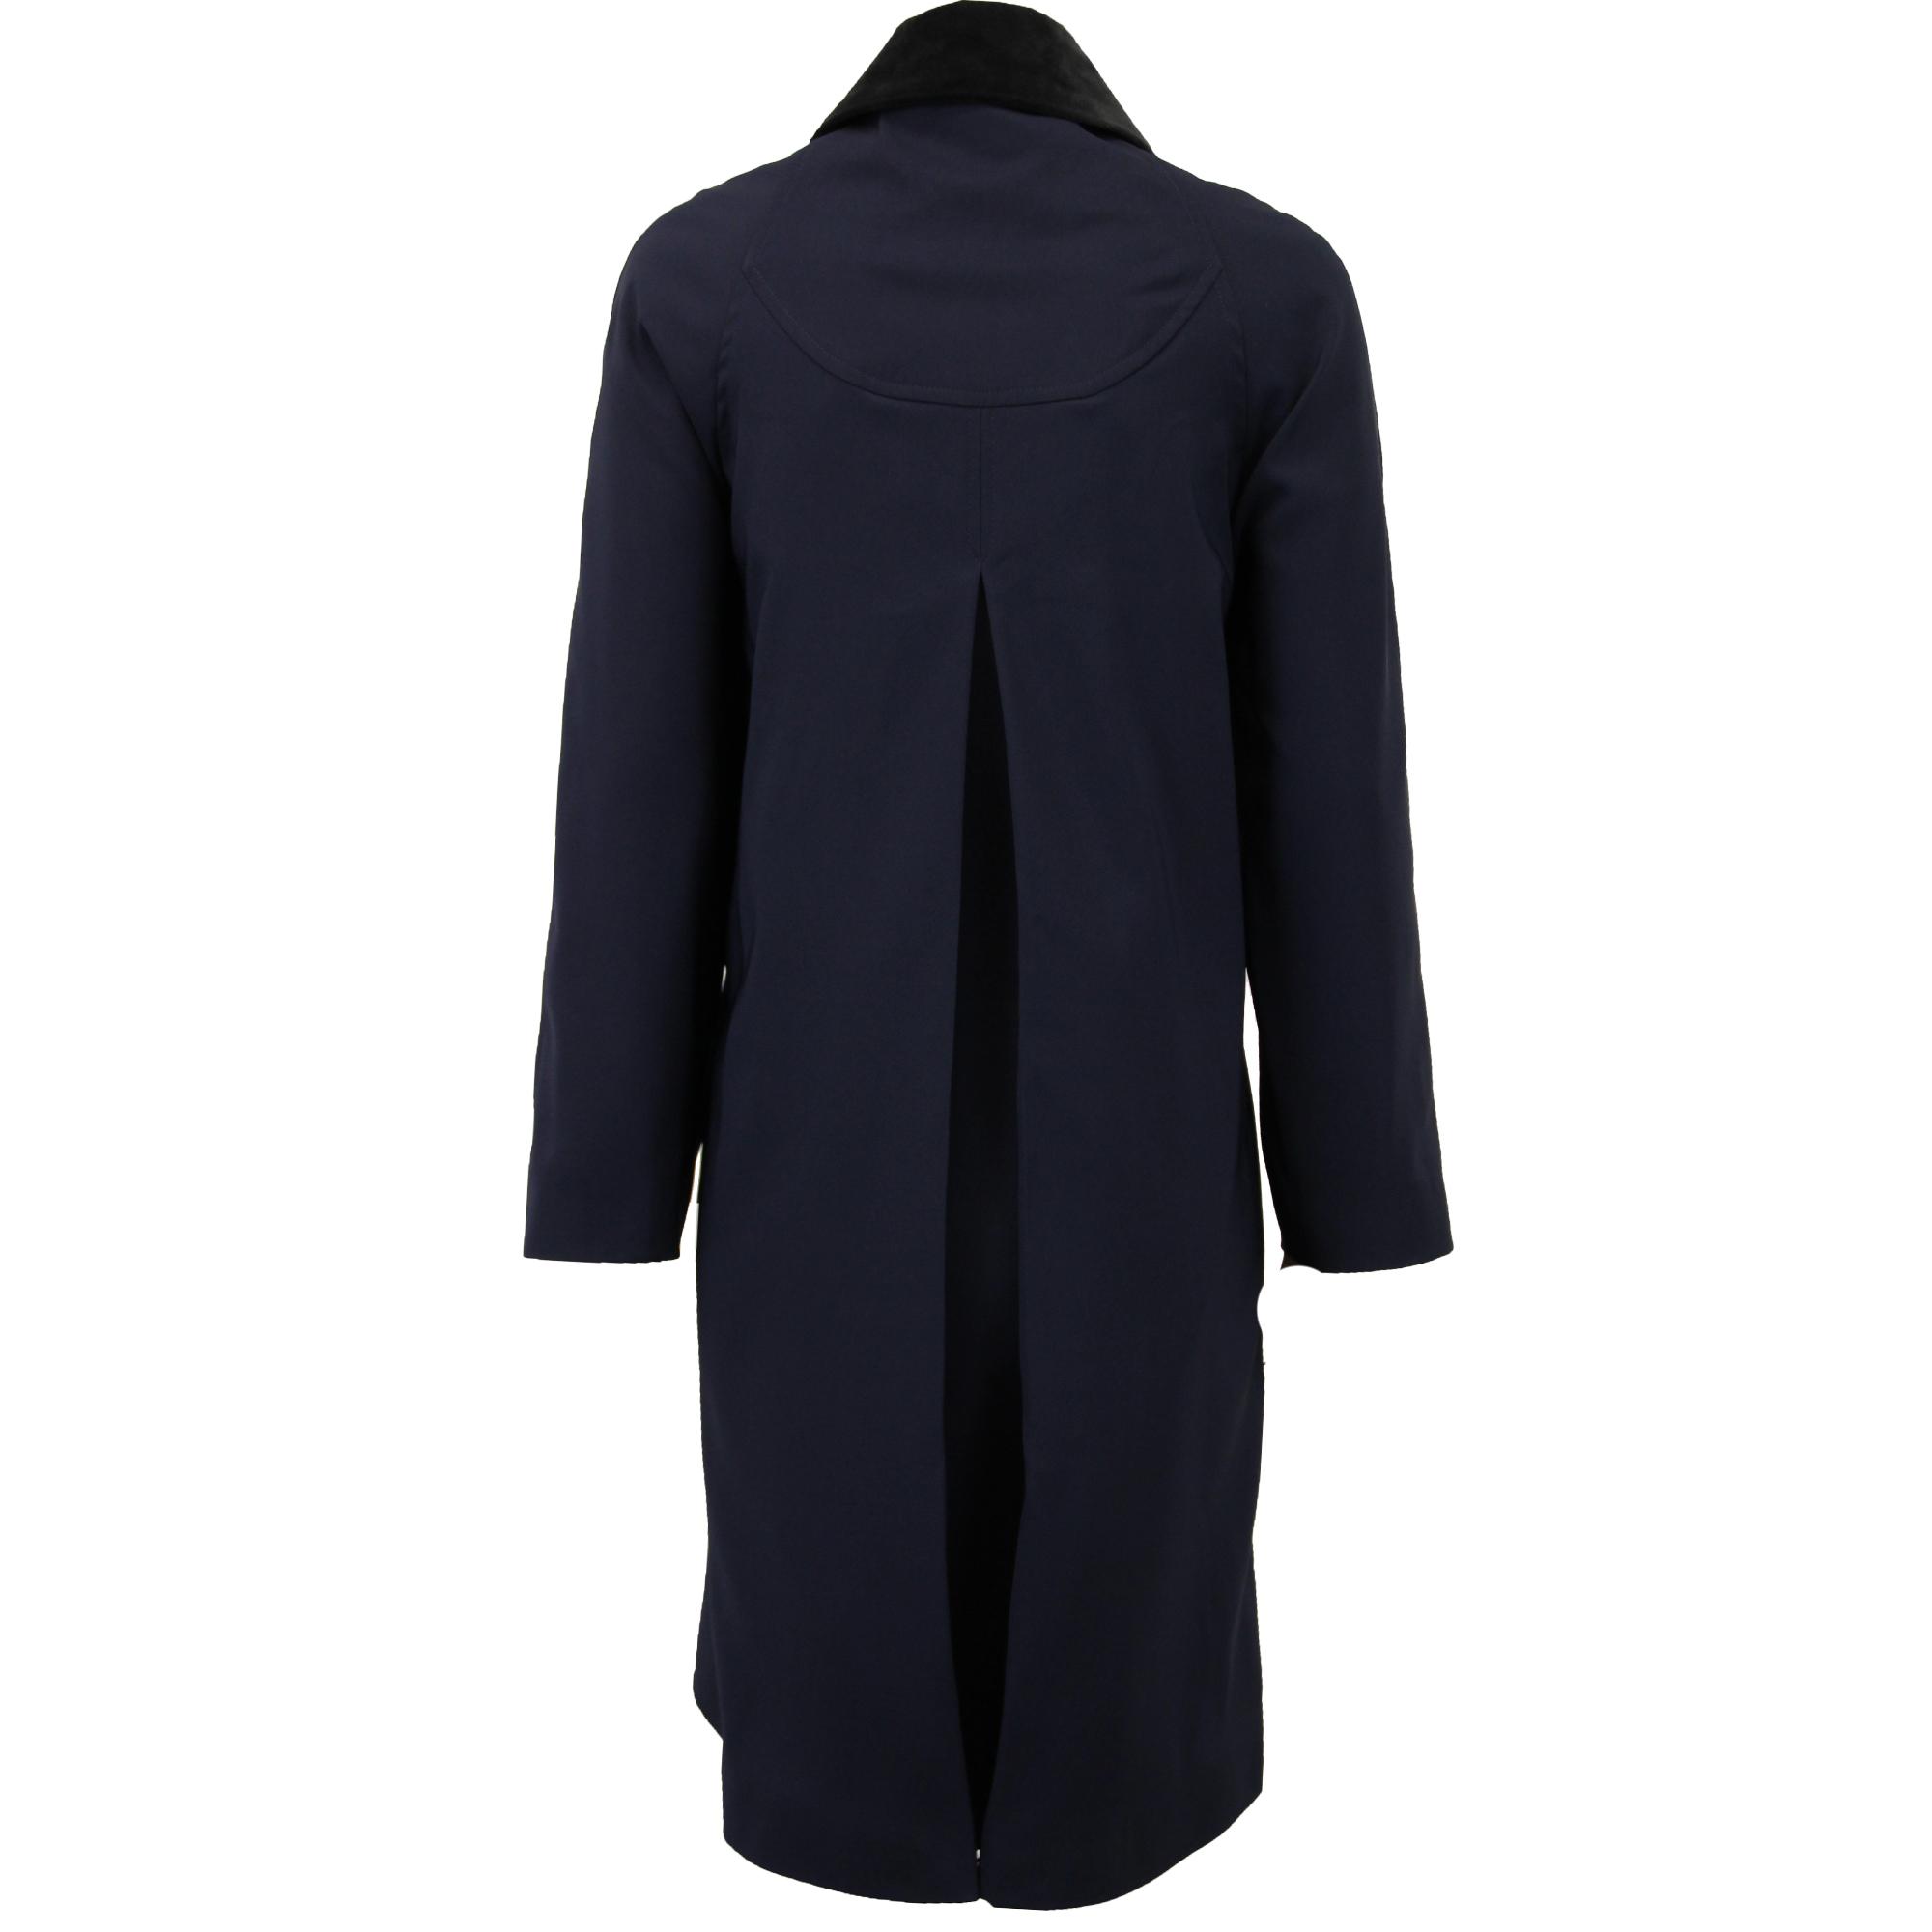 Ladies-Coat-Womens-Jacket-Trench-Overcoat-Velvet-Collar-Long-Casual-Lined-Summer thumbnail 6